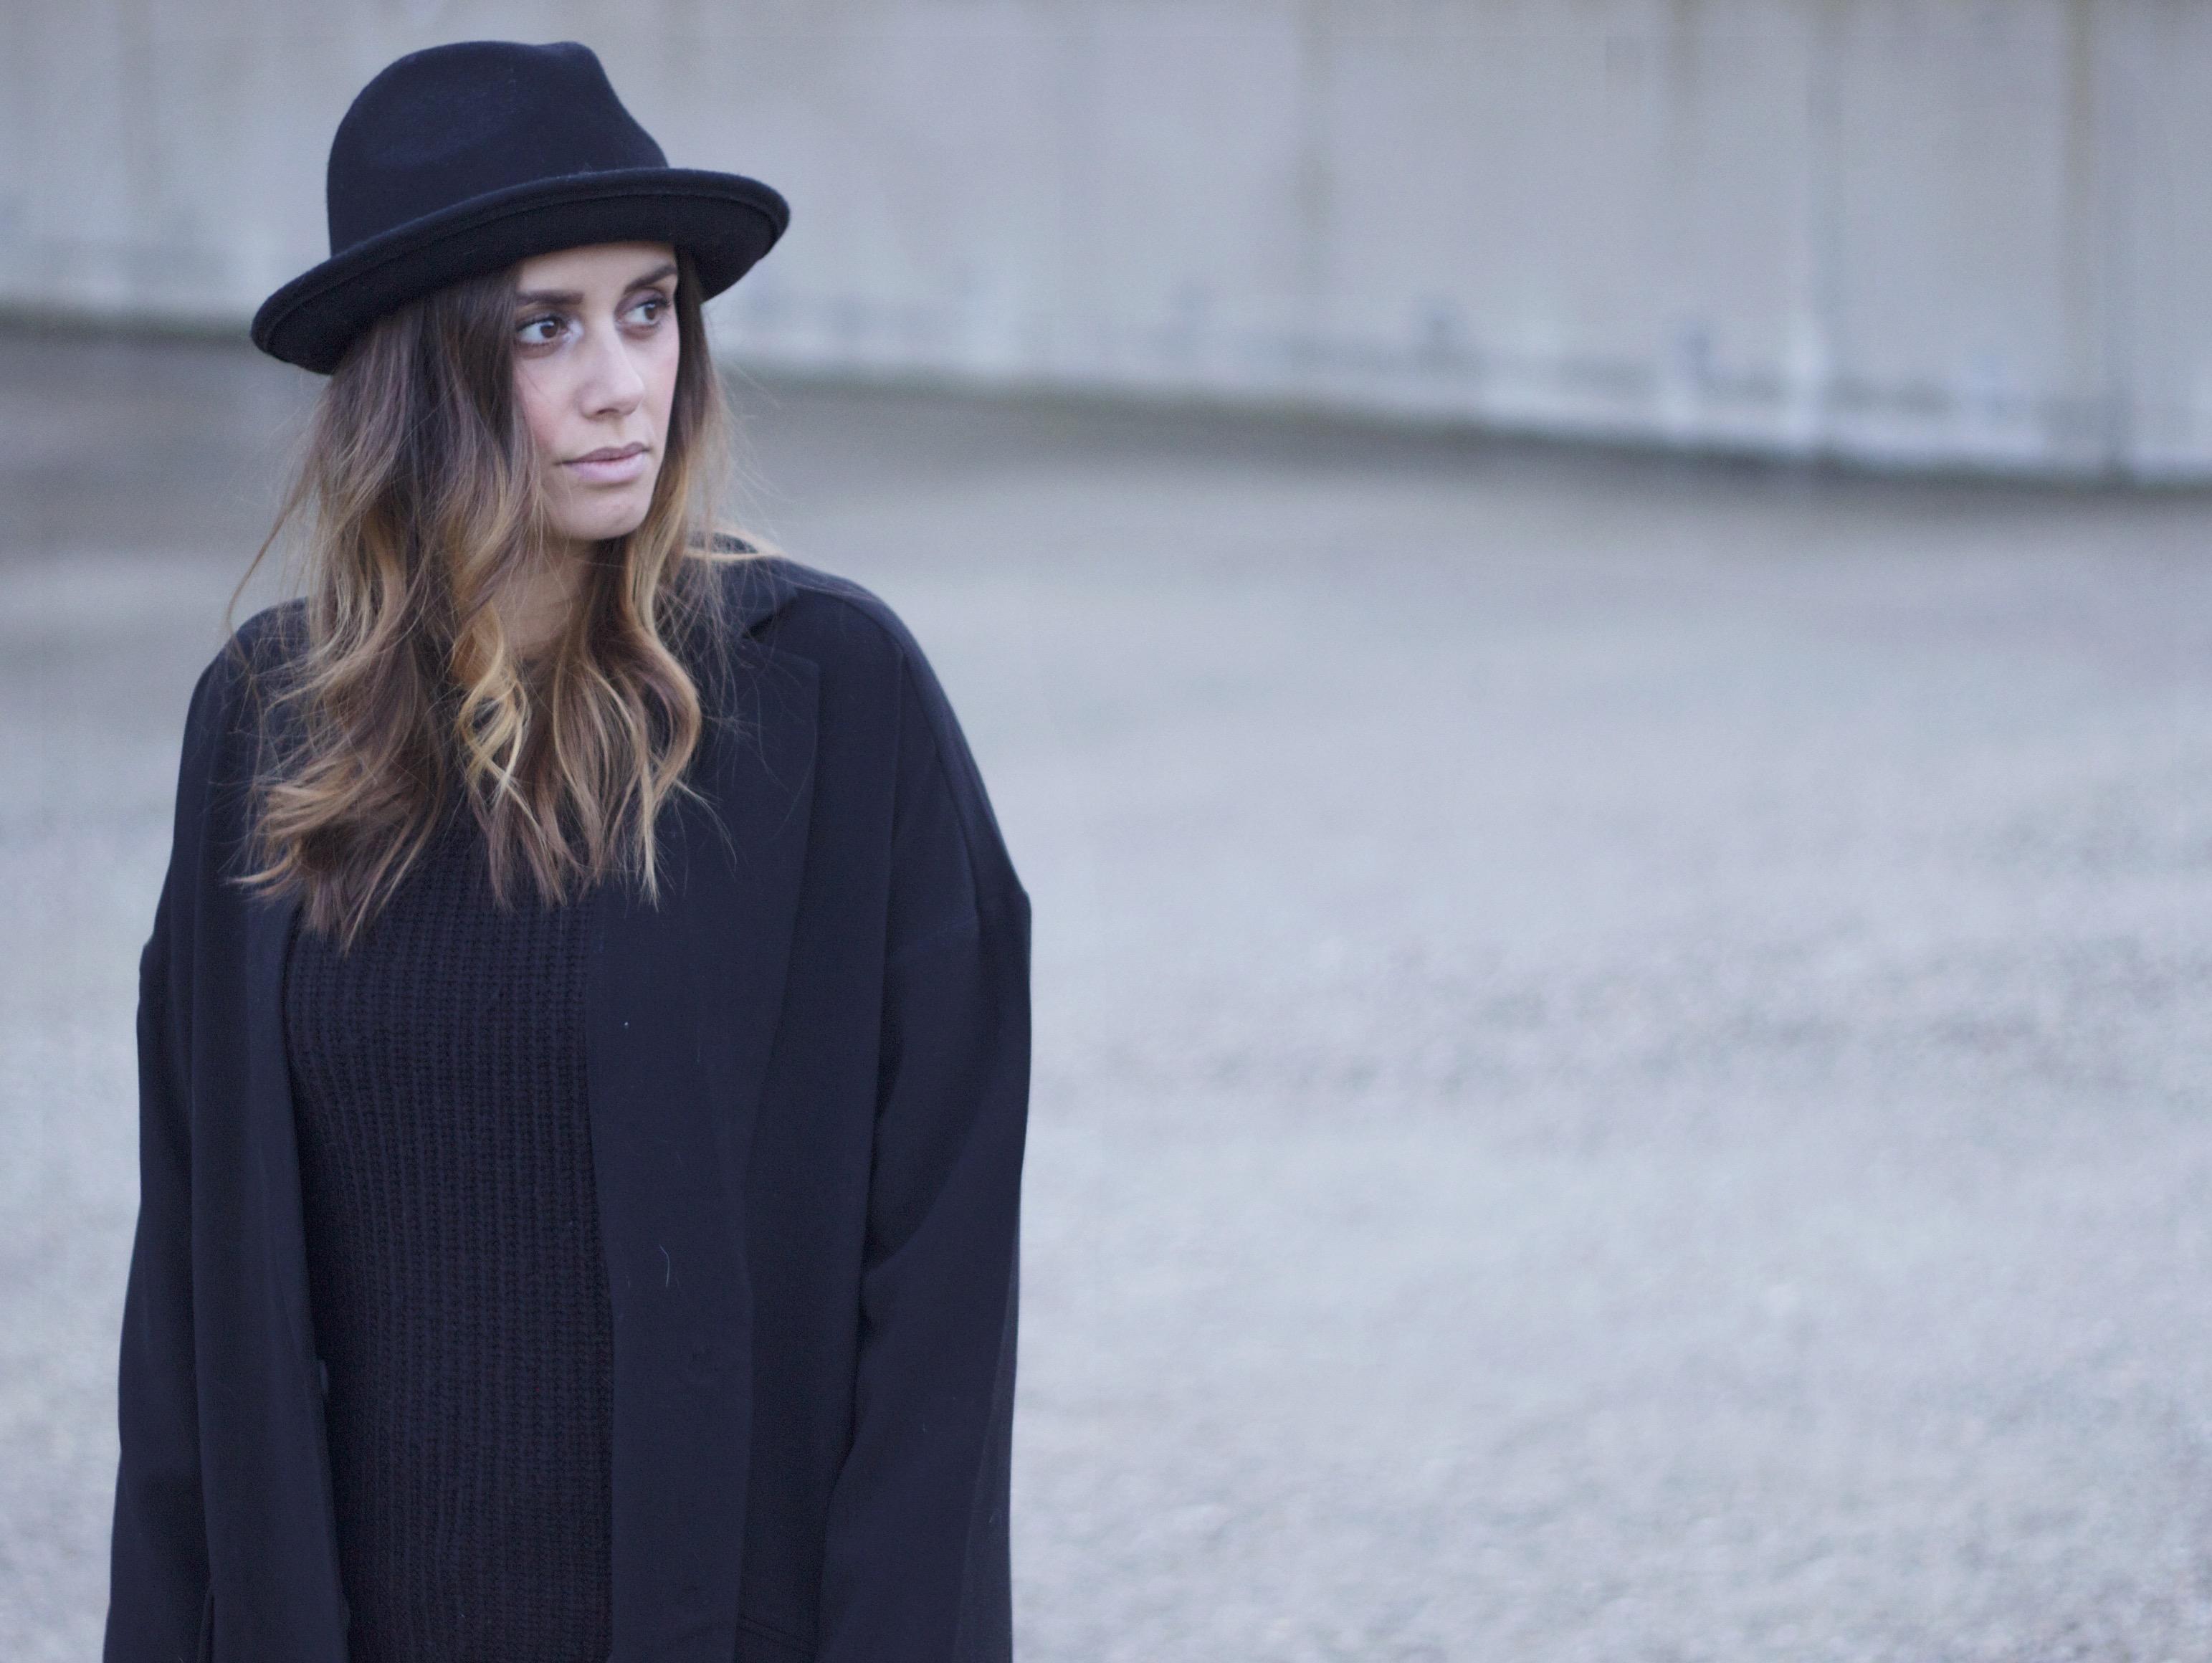 Ombre hair, style, fashion blogger, asos black hat, asos duster coat